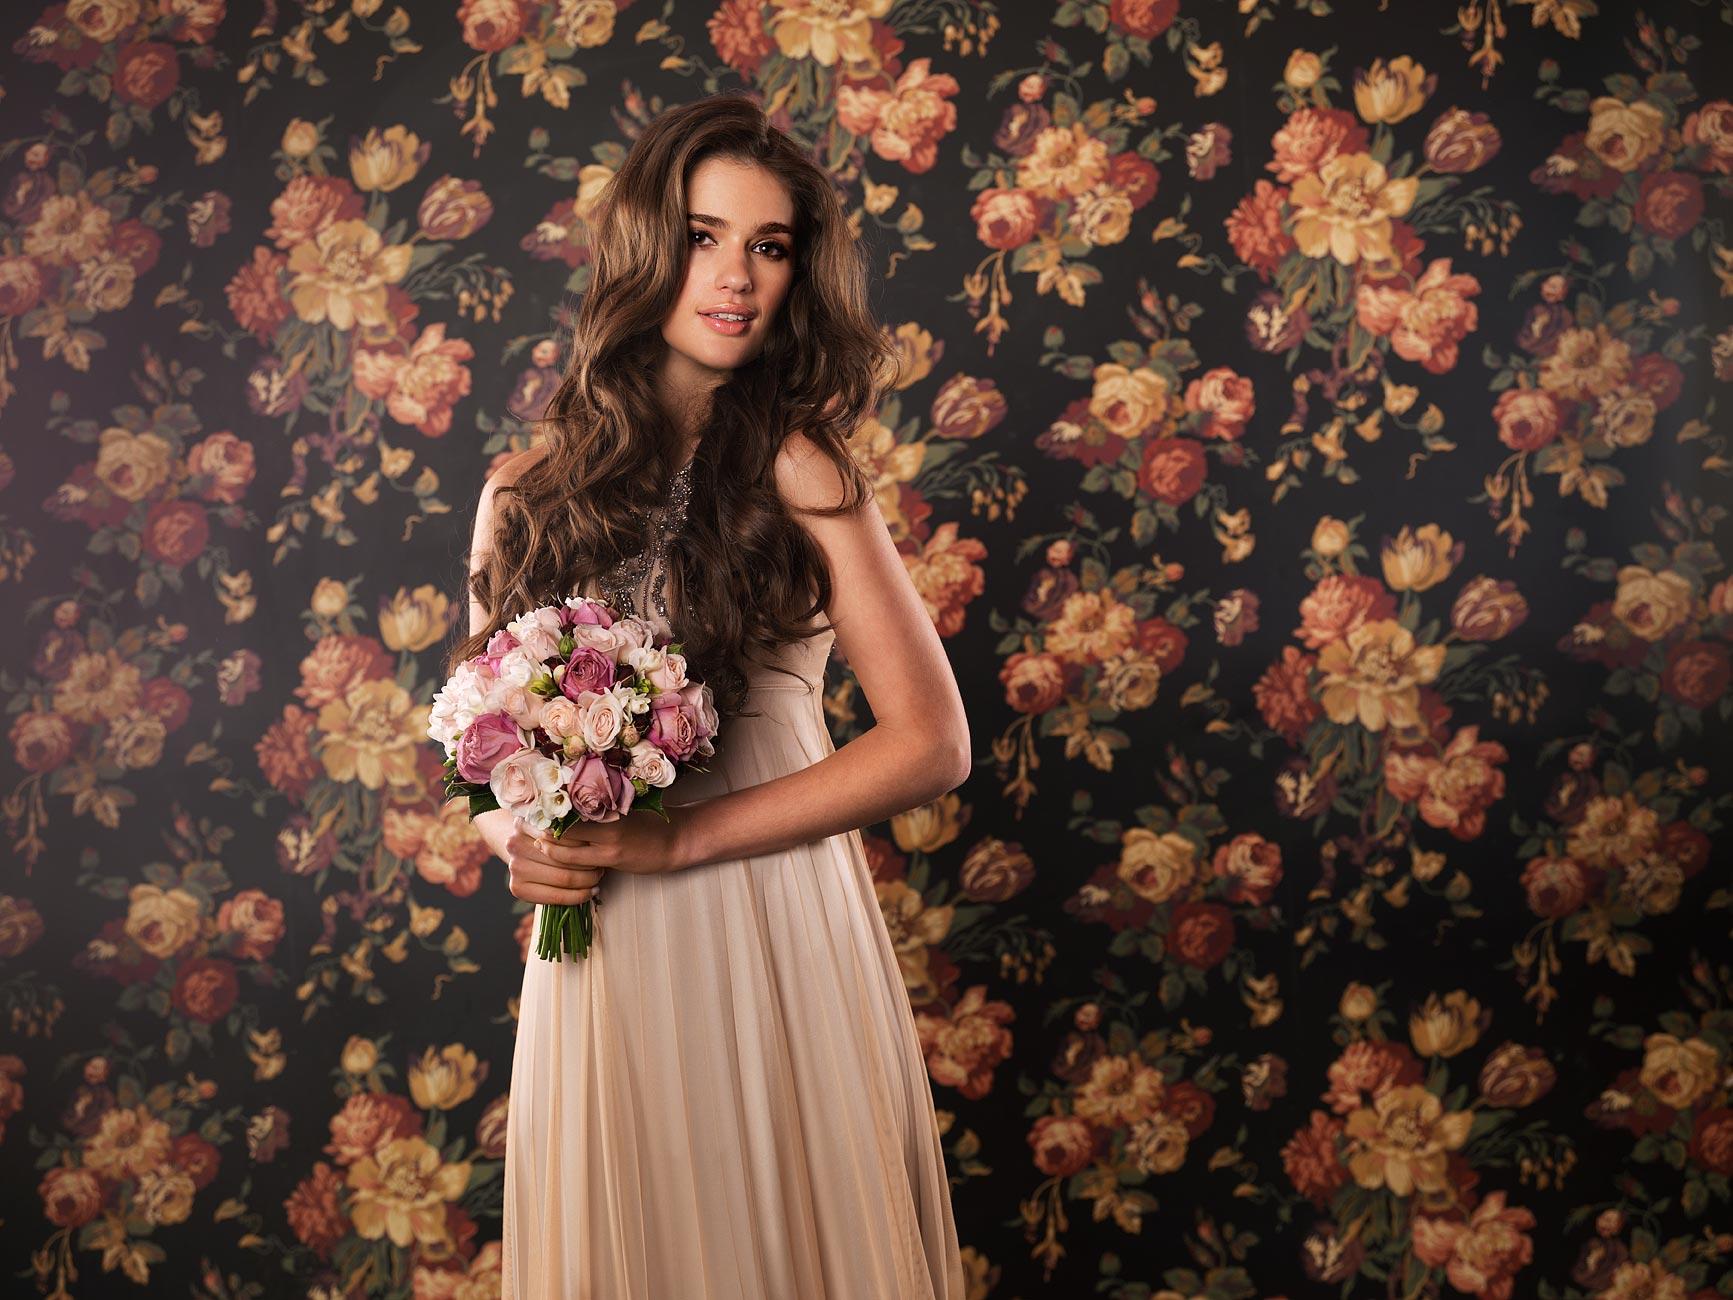 completewedding-fashion-editorial-2.jpg